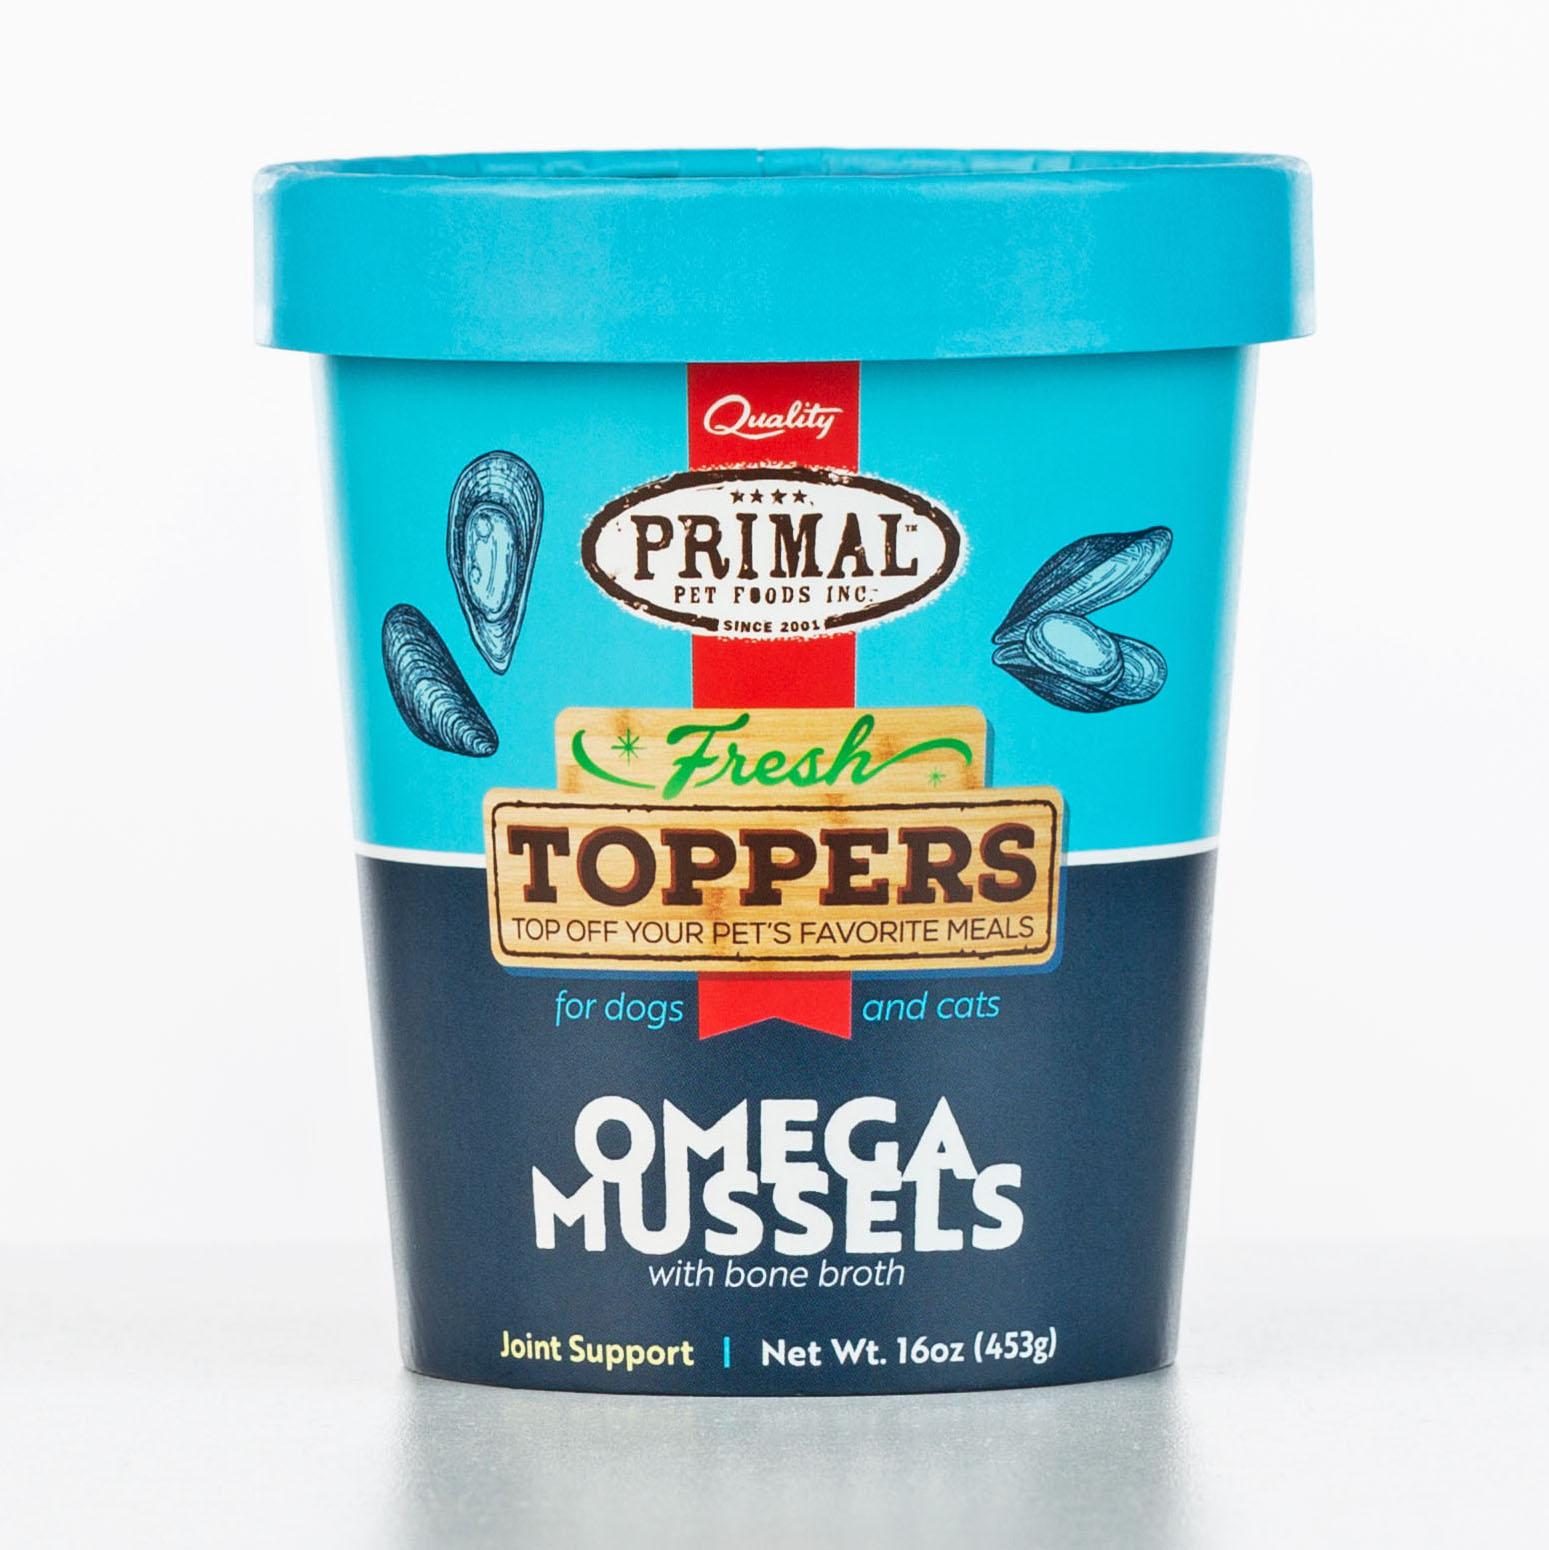 Primal Fresh Toppers Omega Mussels, Frozen Dog & Cat Food Topper Image